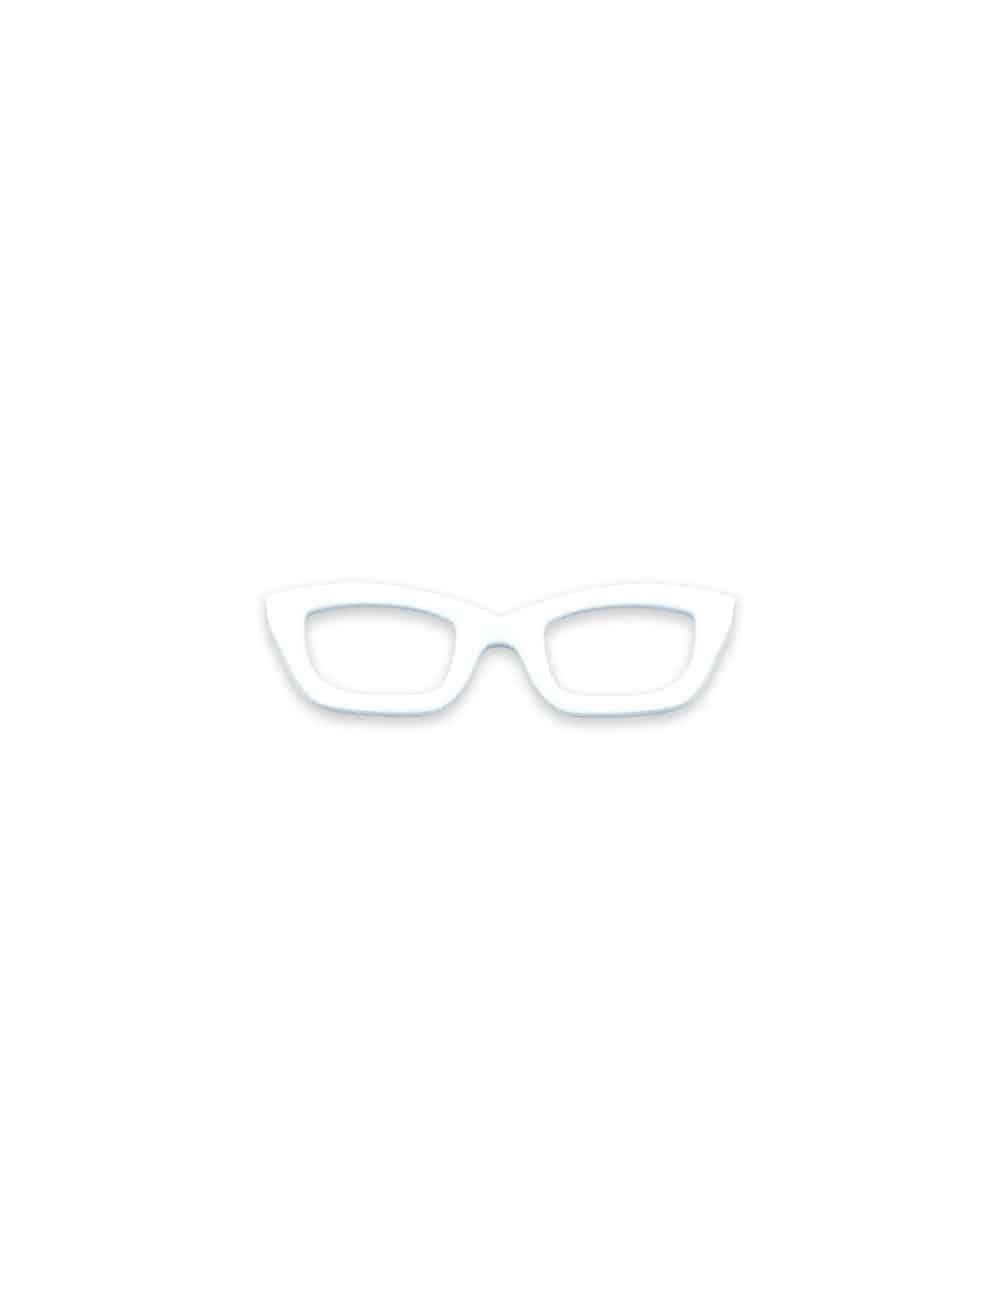 White Frame Spec Tie Clip TC3401-001b